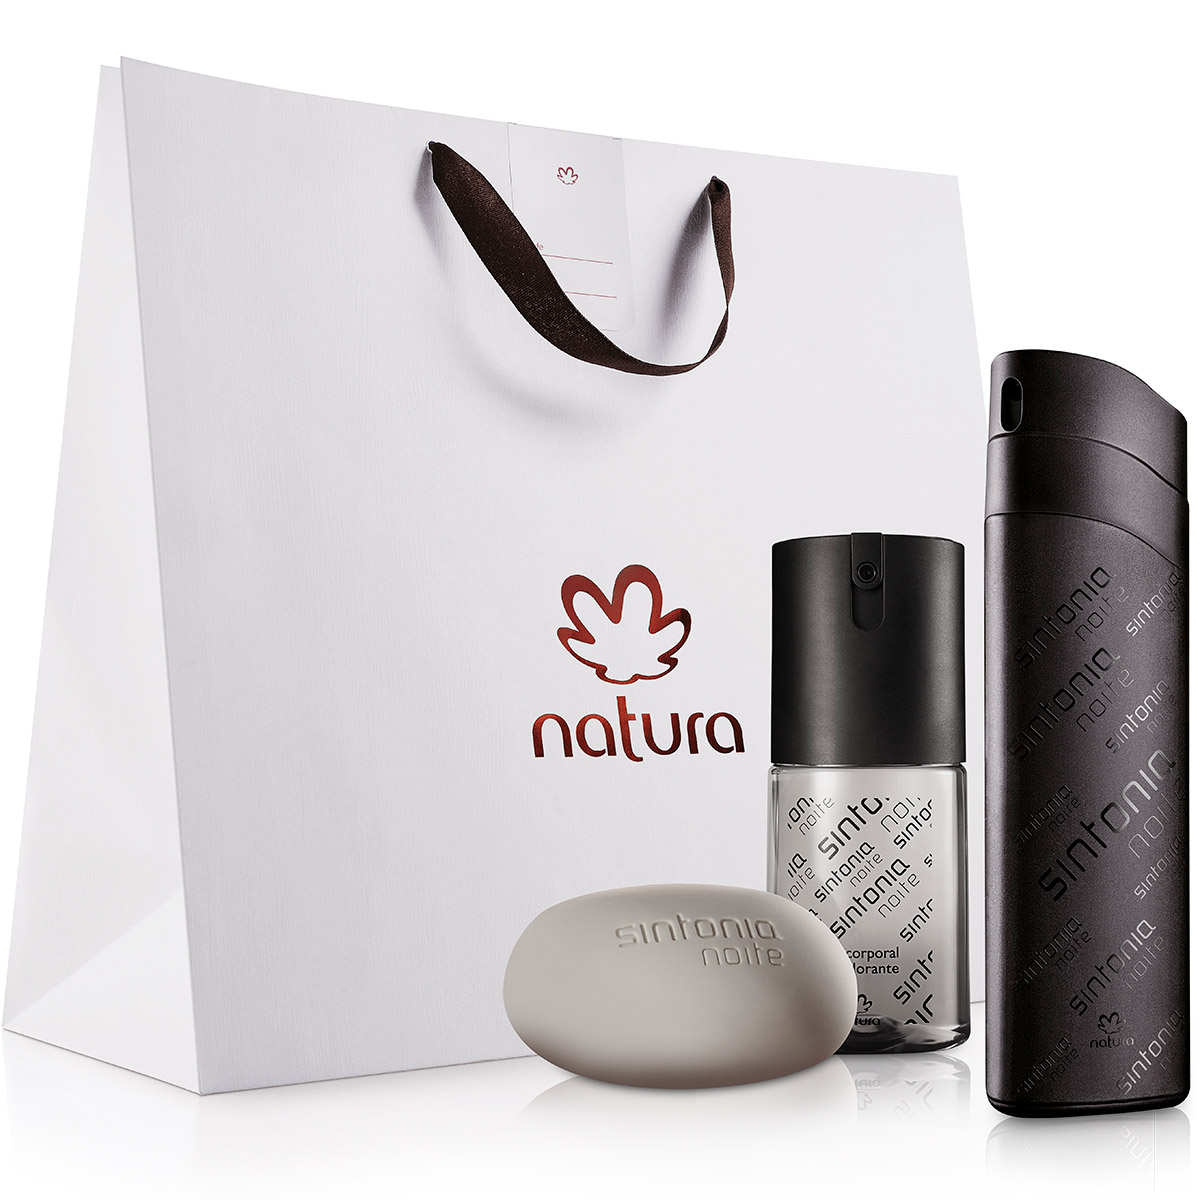 Presente Natura Sintonia Noite - 82542